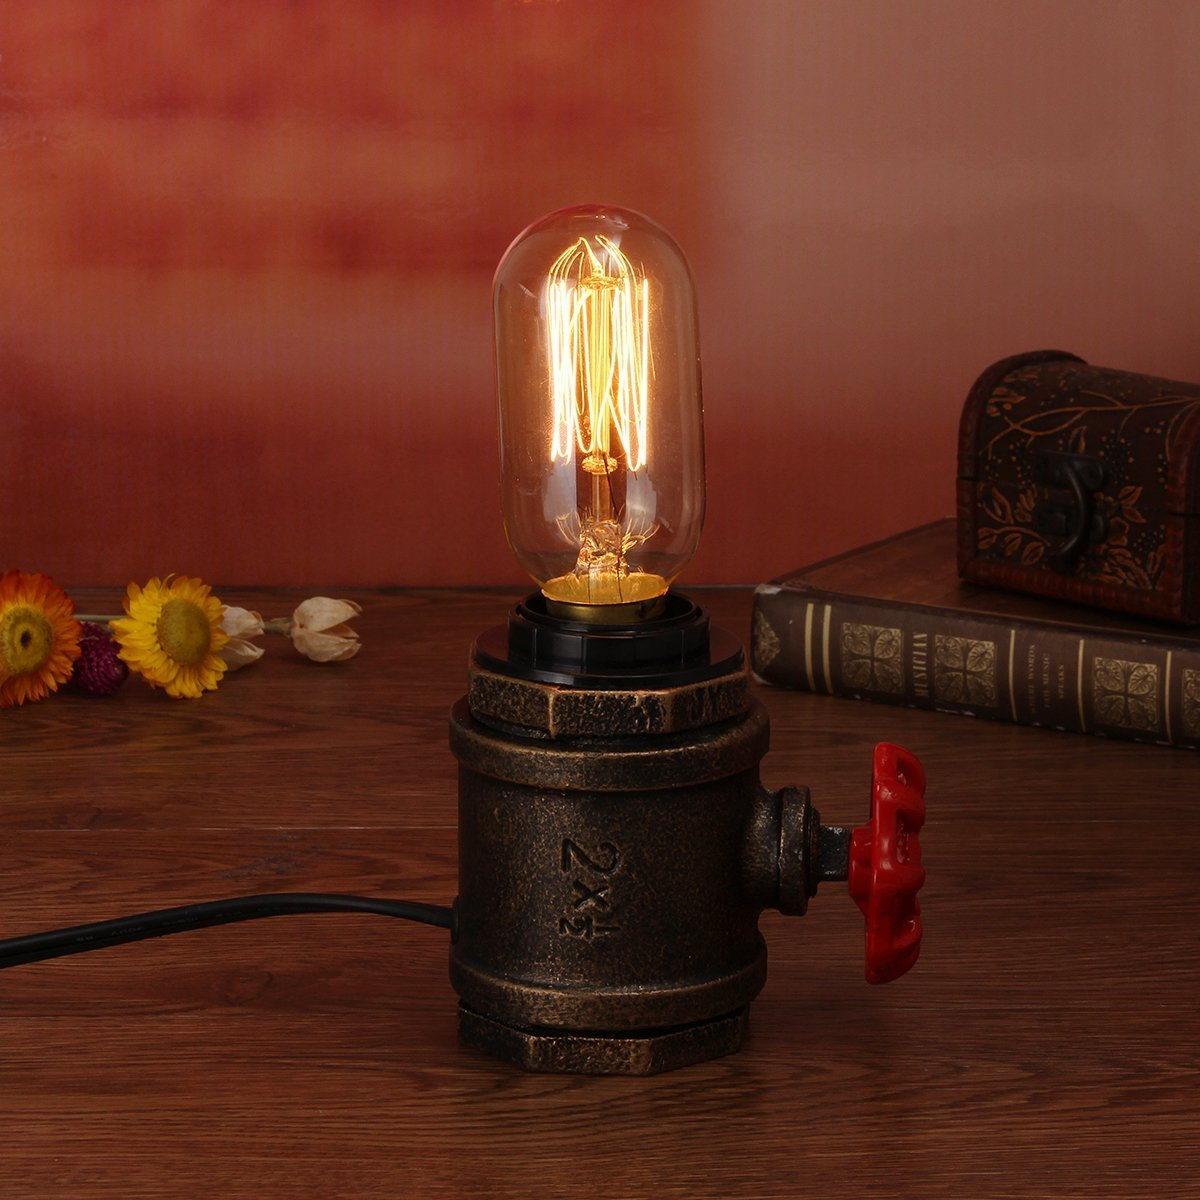 Vintage Retro Table Desk Lamp Lighting Kit Antique Bedroom